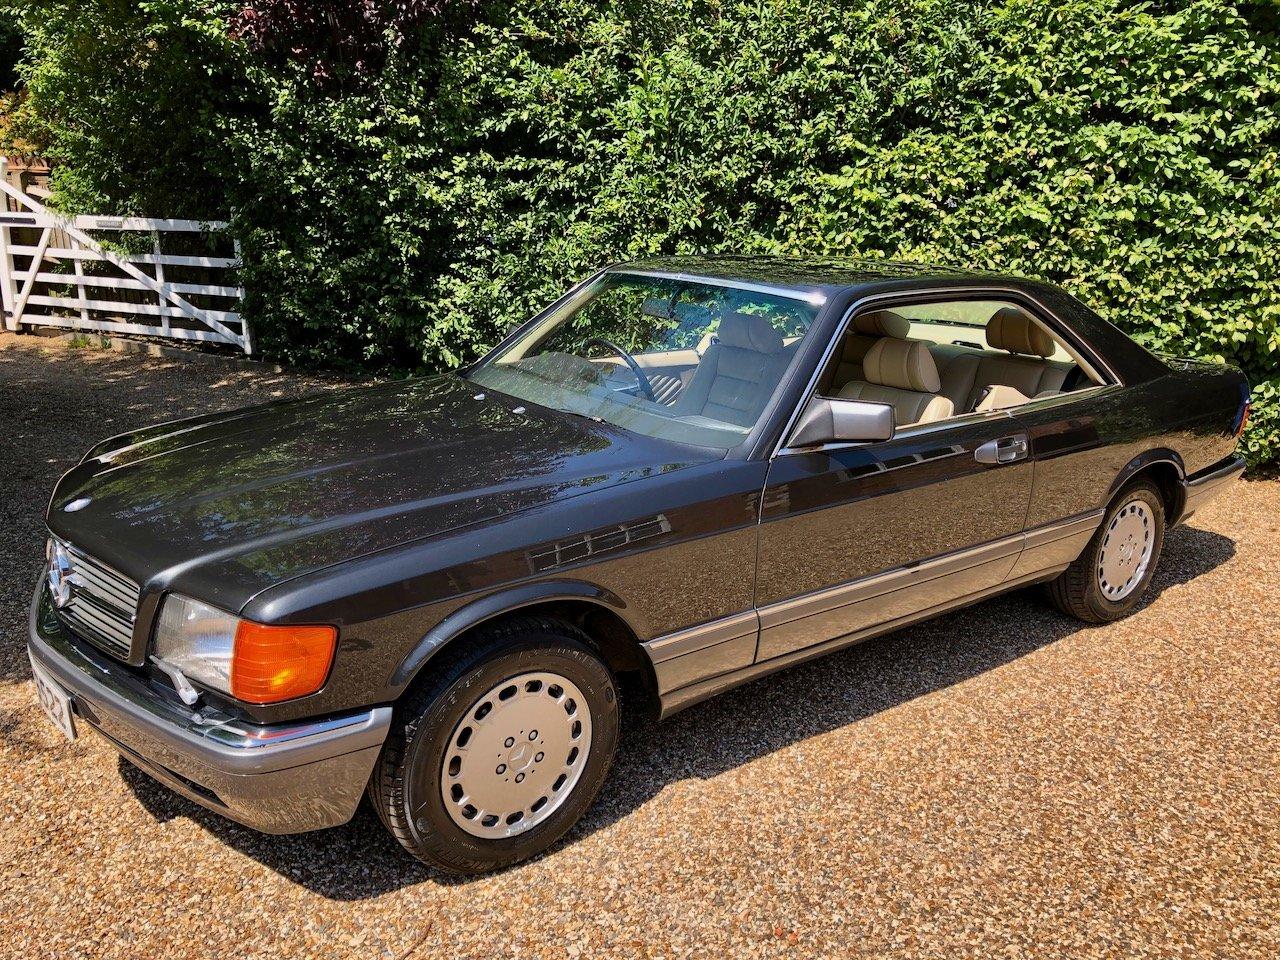 1989 **DEPOSIT TAKEN** Mercedes 500SEC C126 560SEC 420 SEC For Sale (picture 3 of 6)